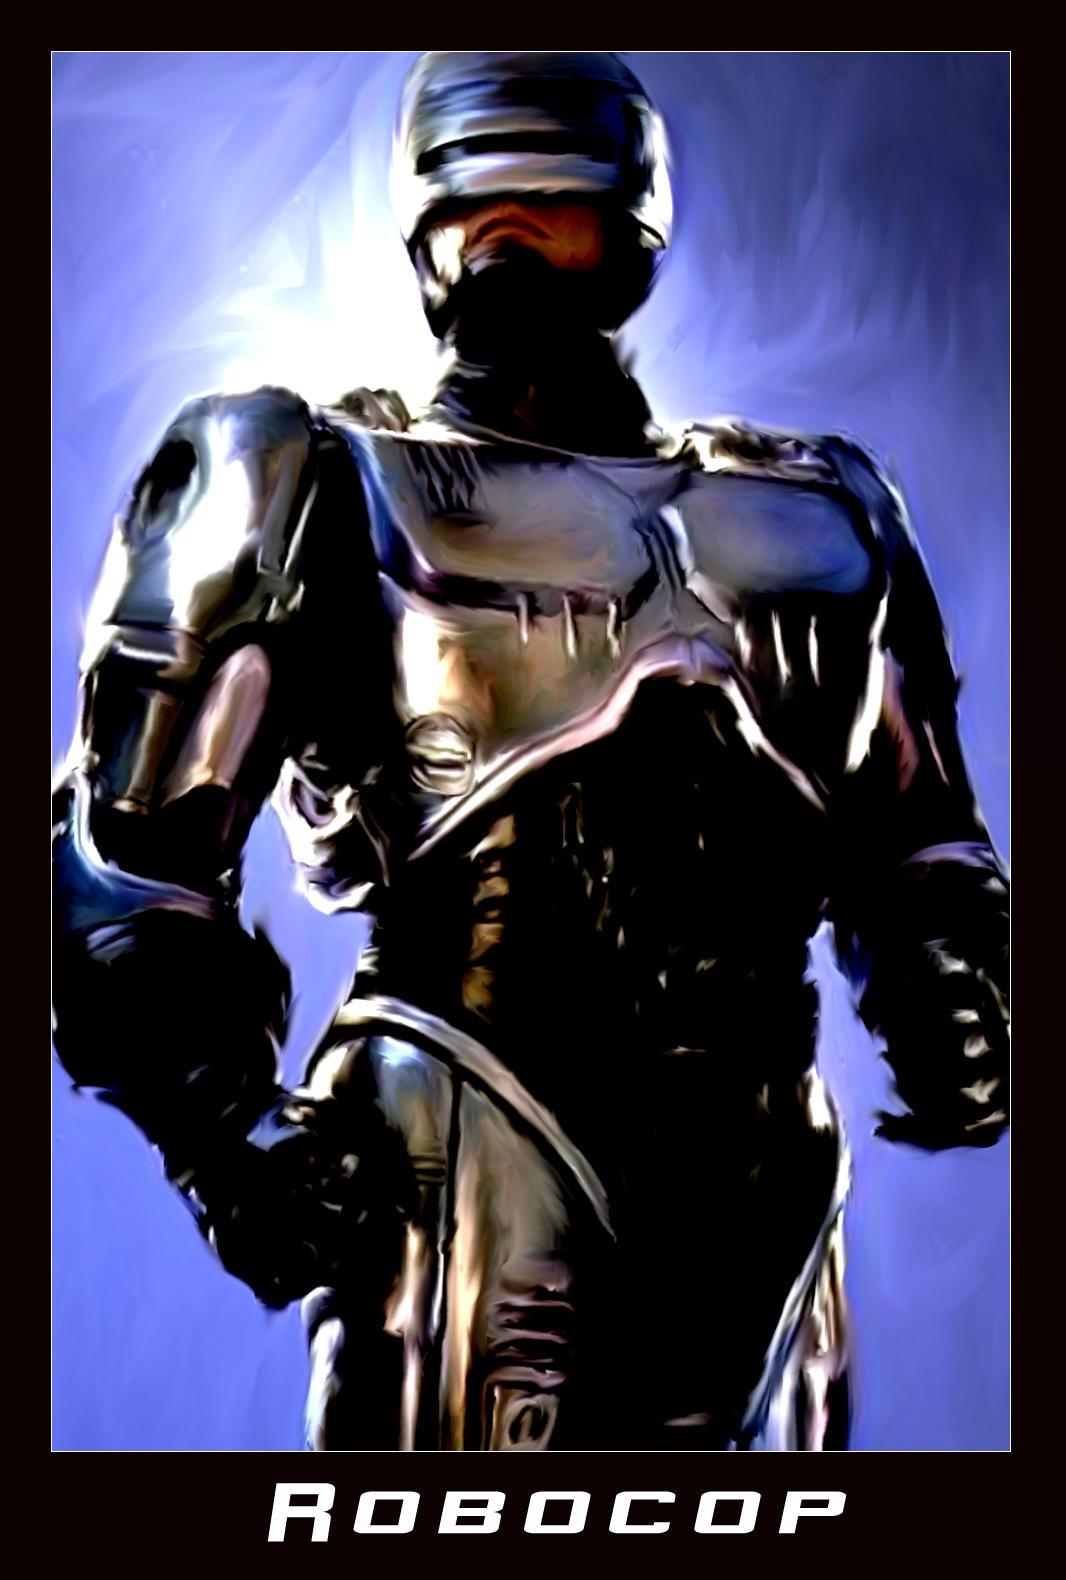 Robocop by sid on DeviantArt